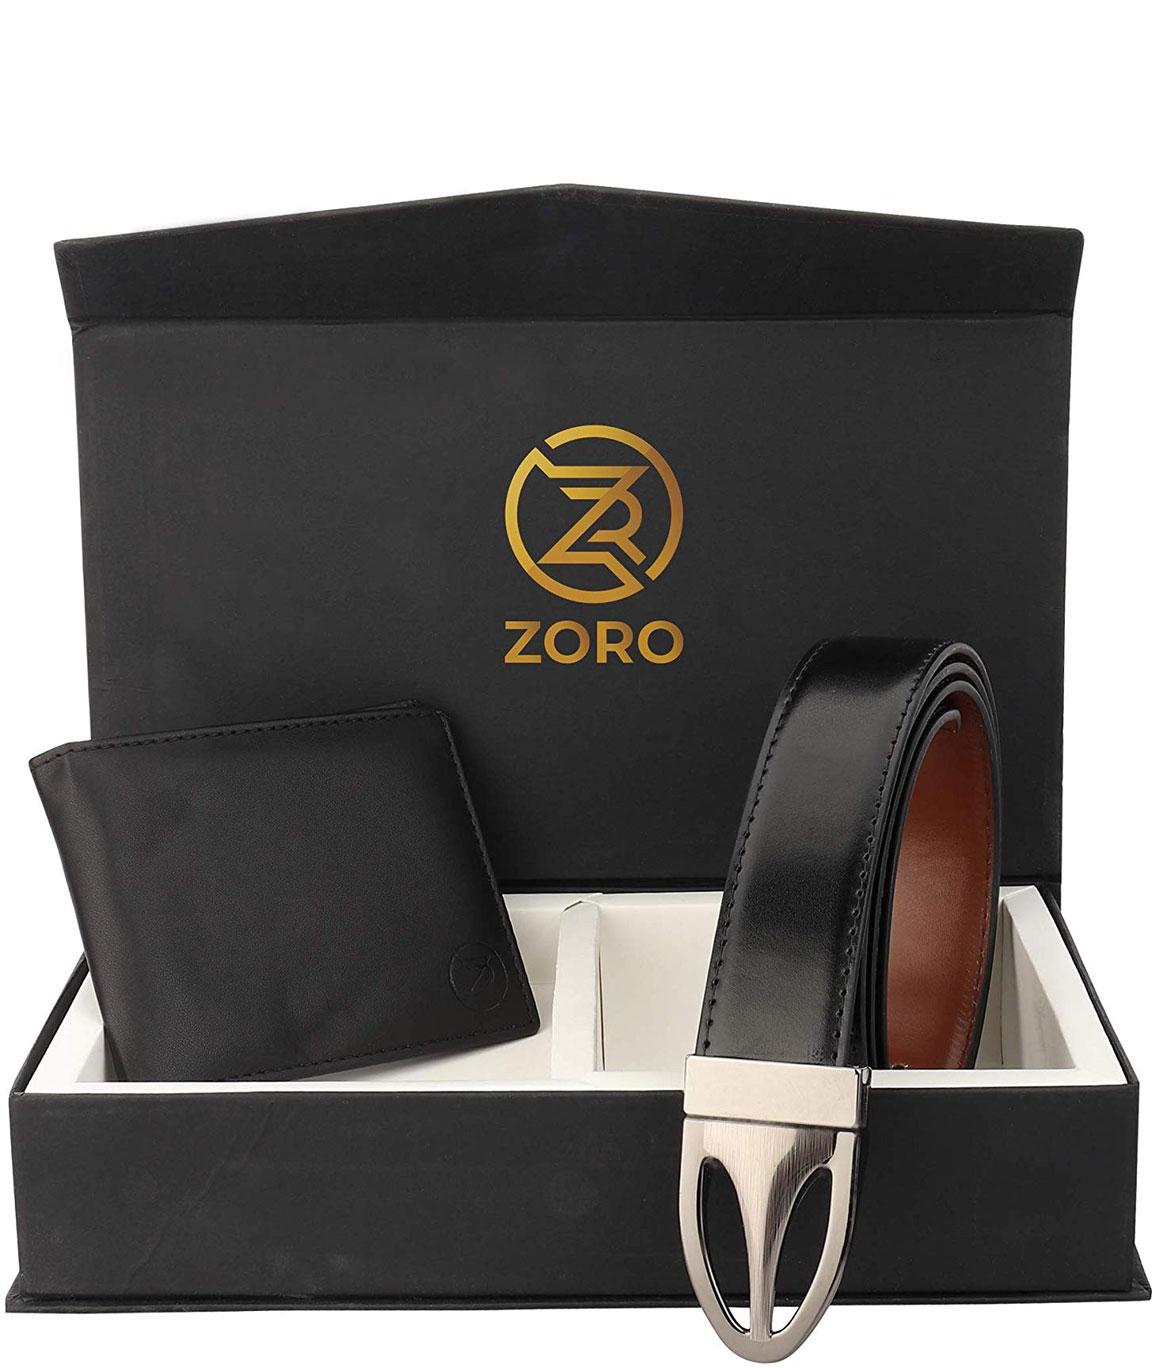 ZORO Reversible PU belt and wallet combo, formal black and brown reversible belt, gift for mens, gents belt, mens wallet ZR-TX07H-31K